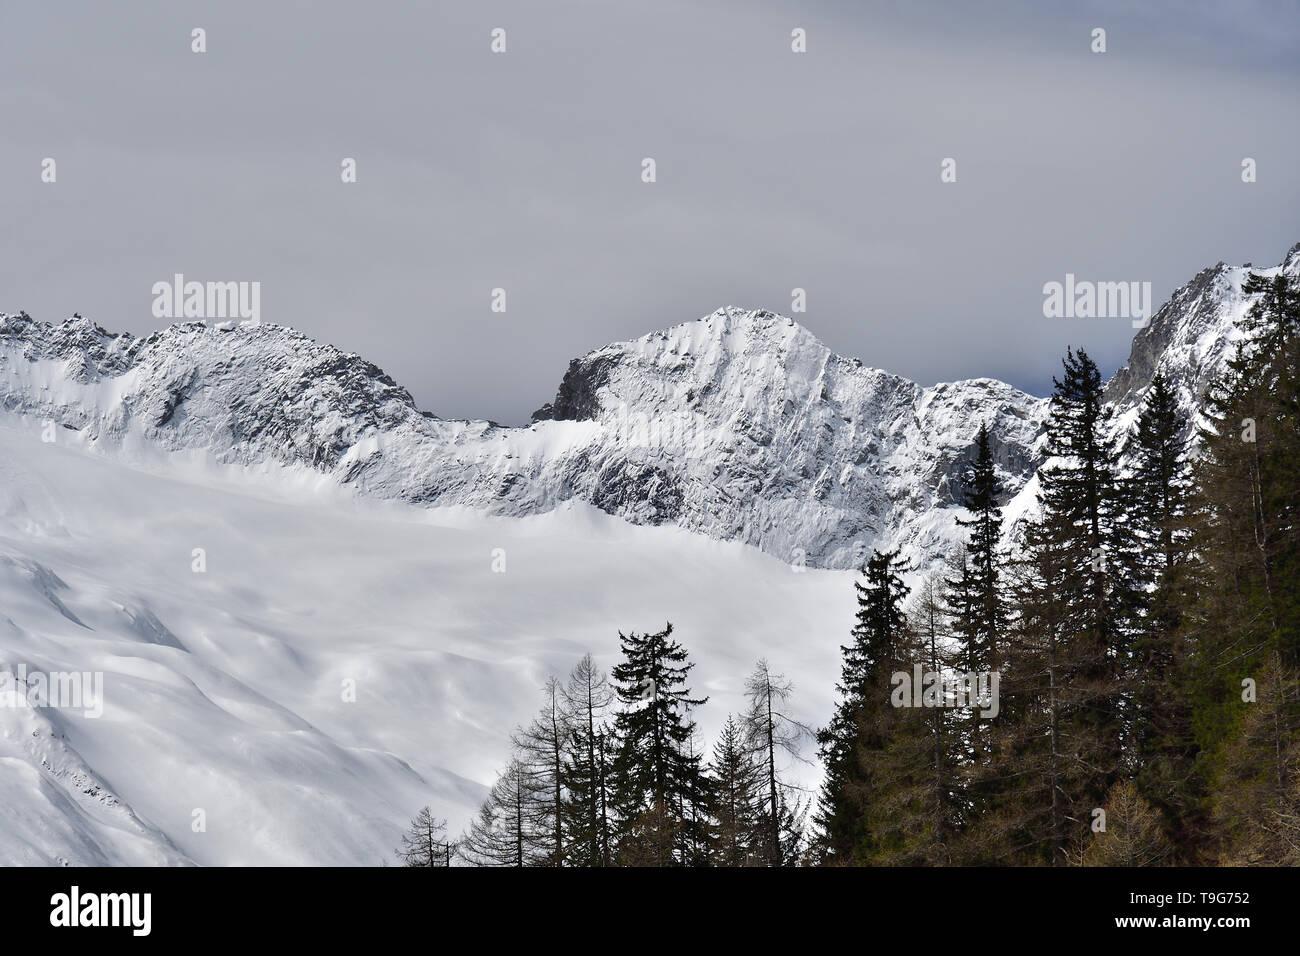 Picture taken in Chiareggio Valley, Rhaetian Alps - Stock Image